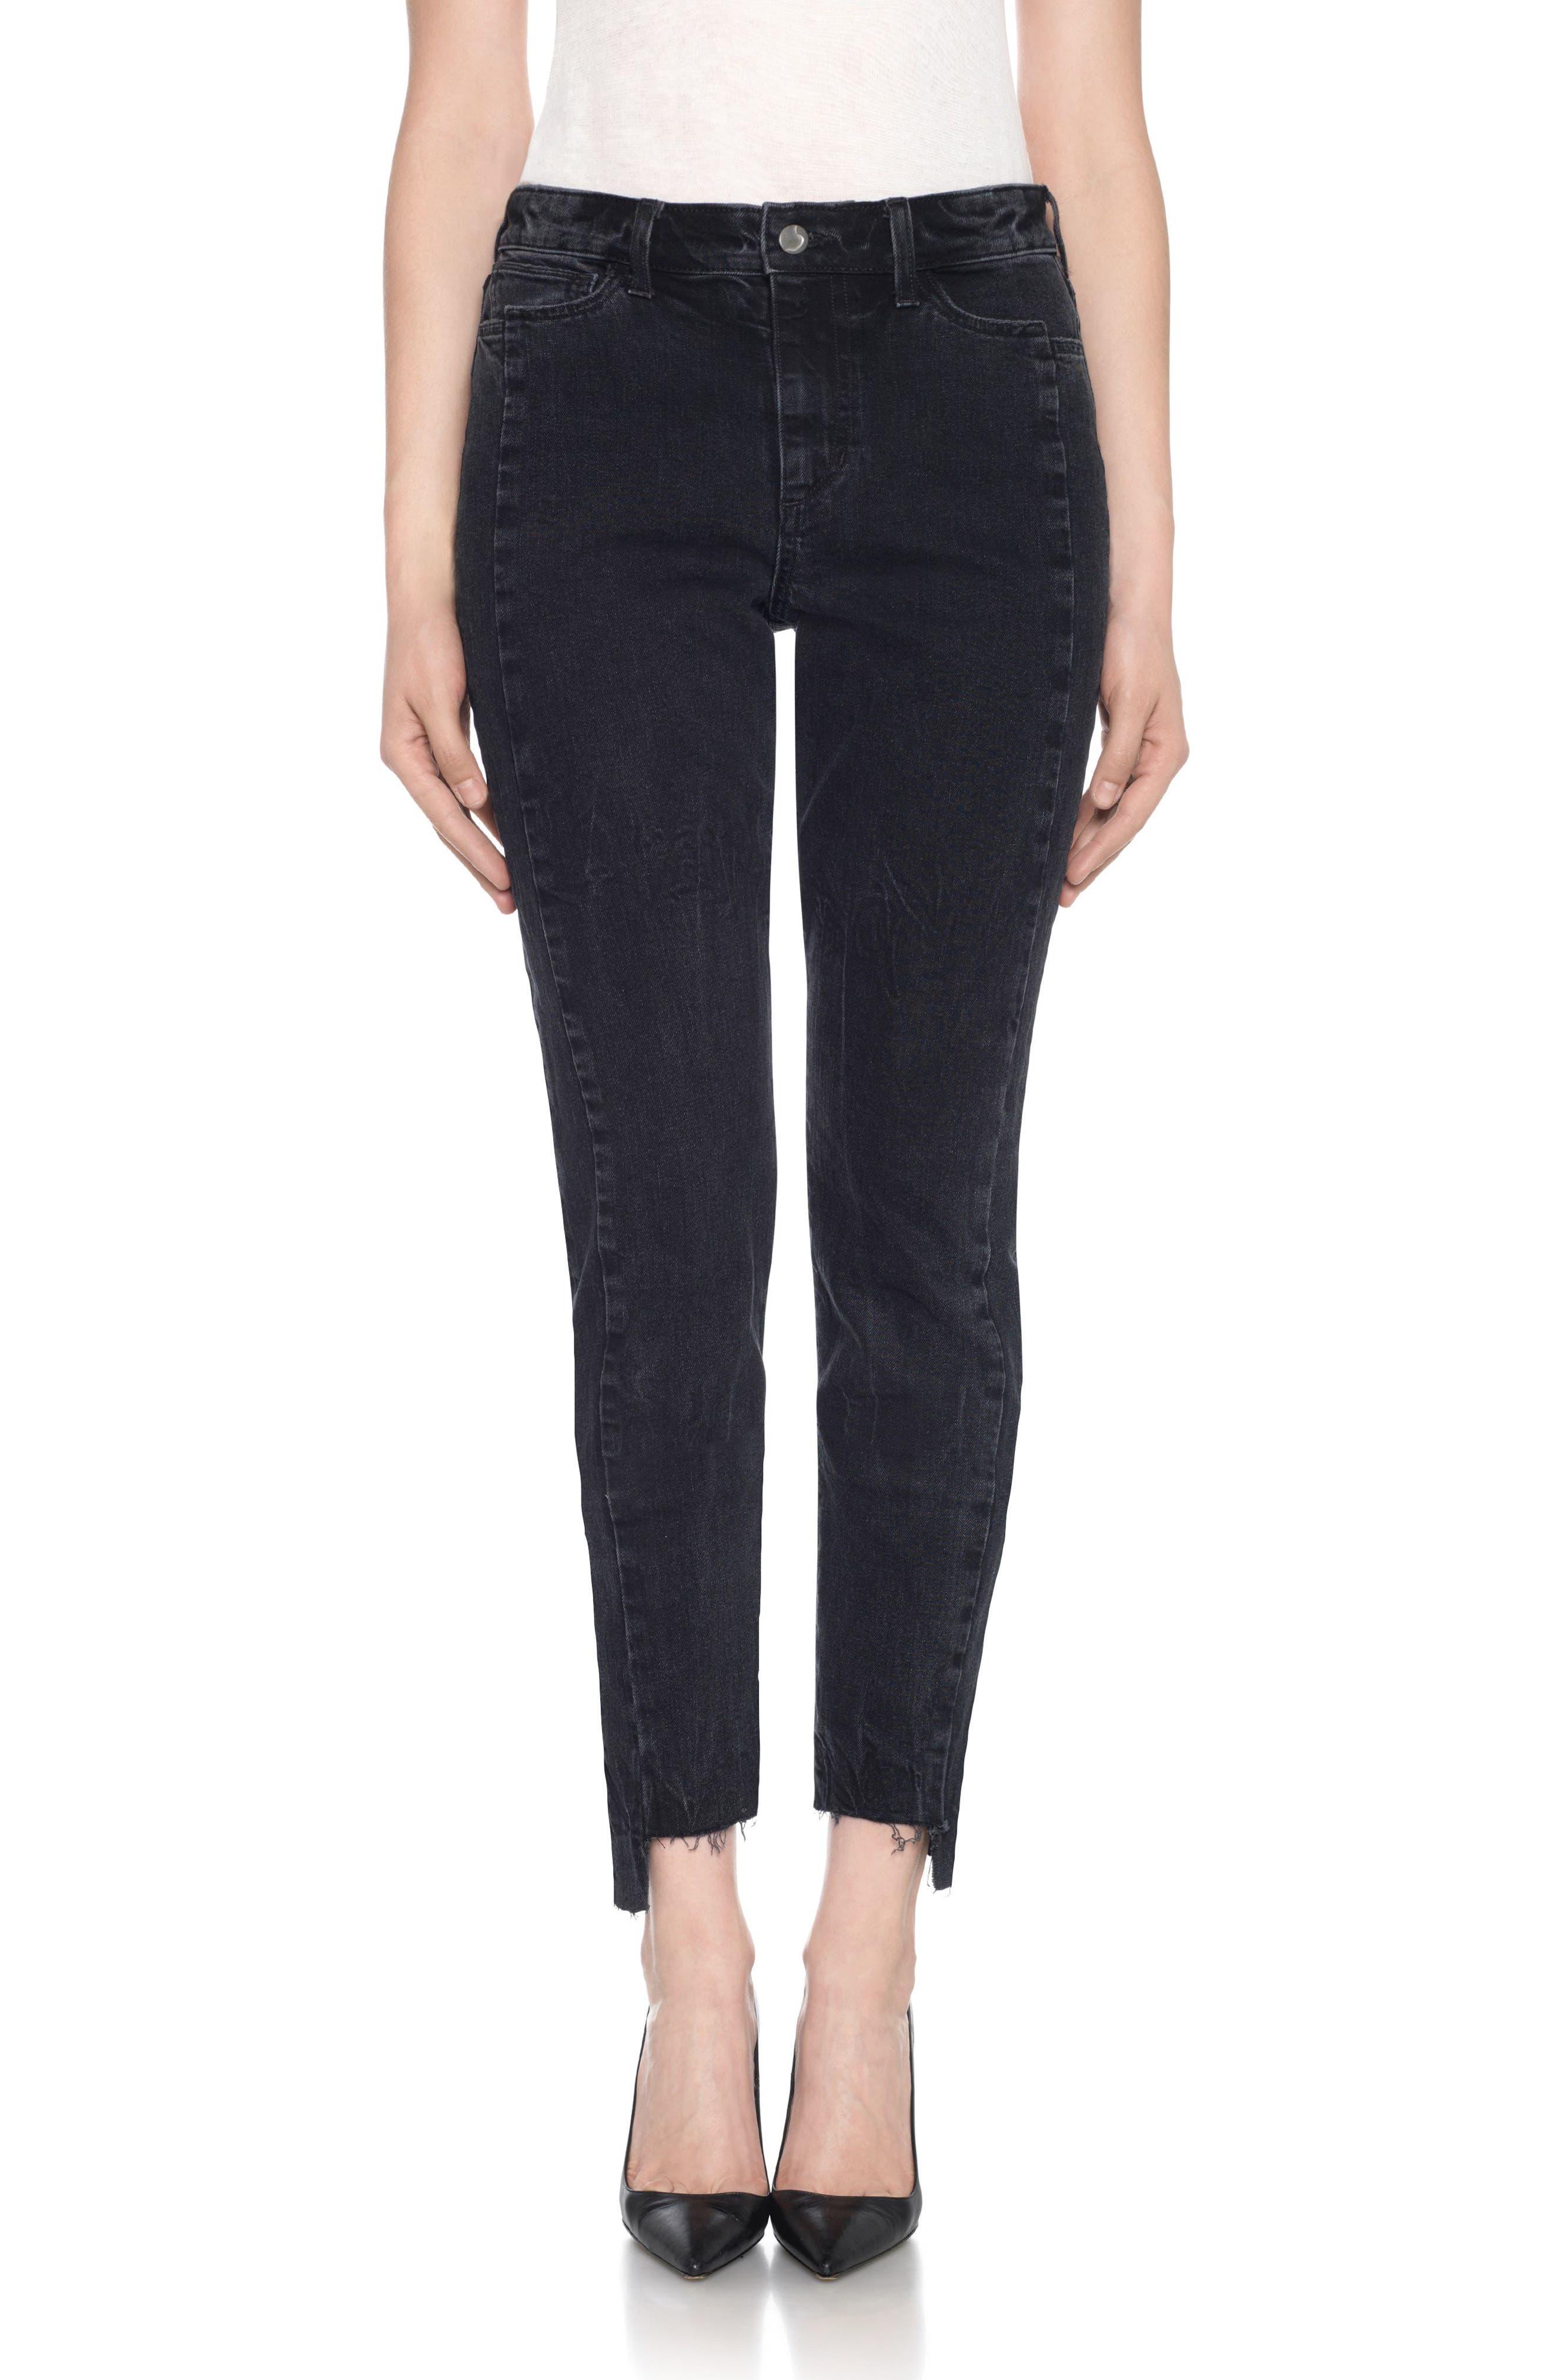 Taylor Hill x Joe's Kass Raw Step Hem Ankle Skinny Jeans,                         Main,                         color, Domino